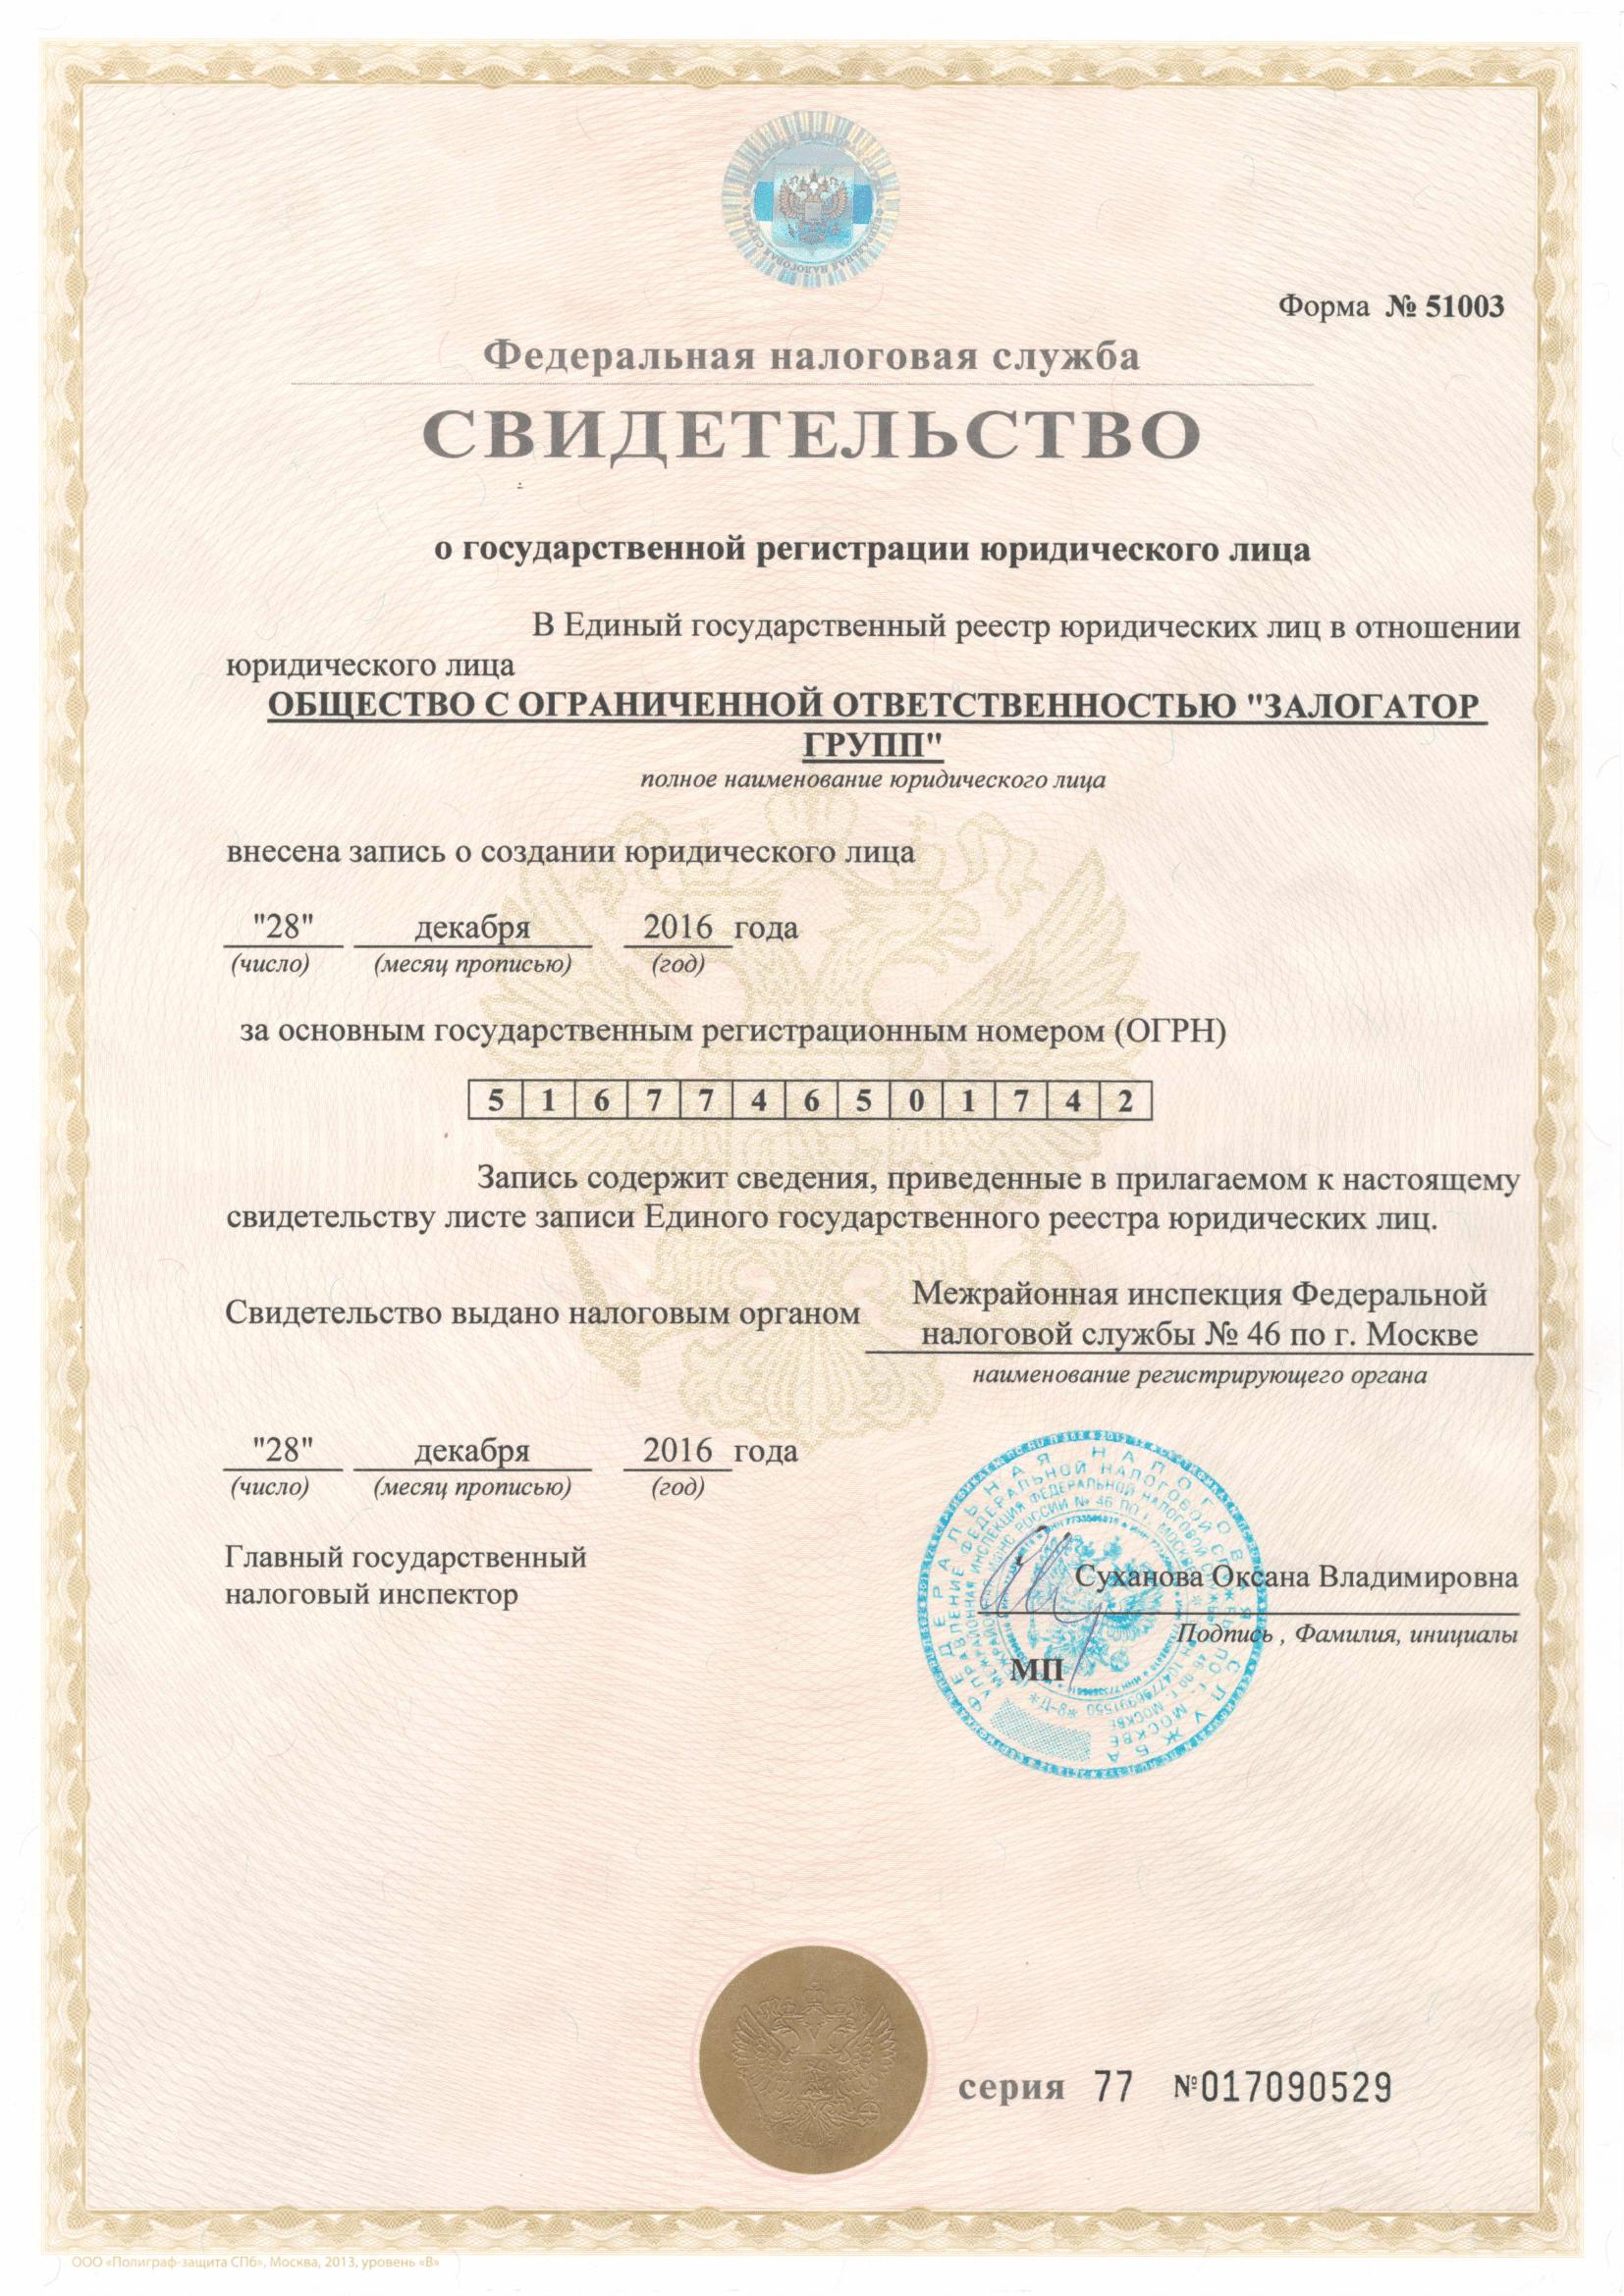 Автоломбард в Воронеже под залог ПТС круглосуточно